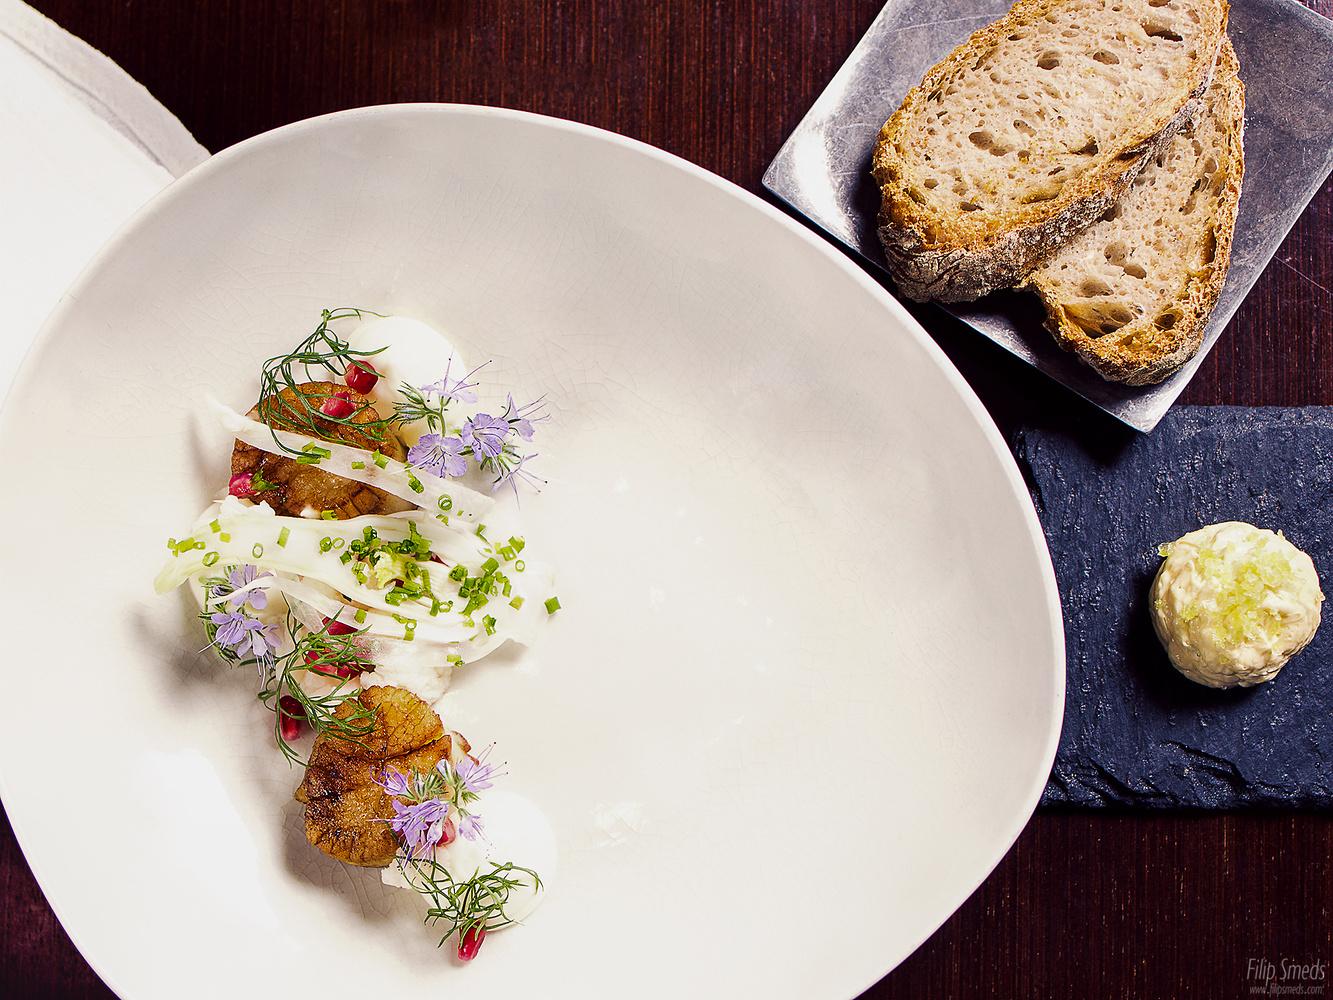 Deliciuos clams by Filip Smeds